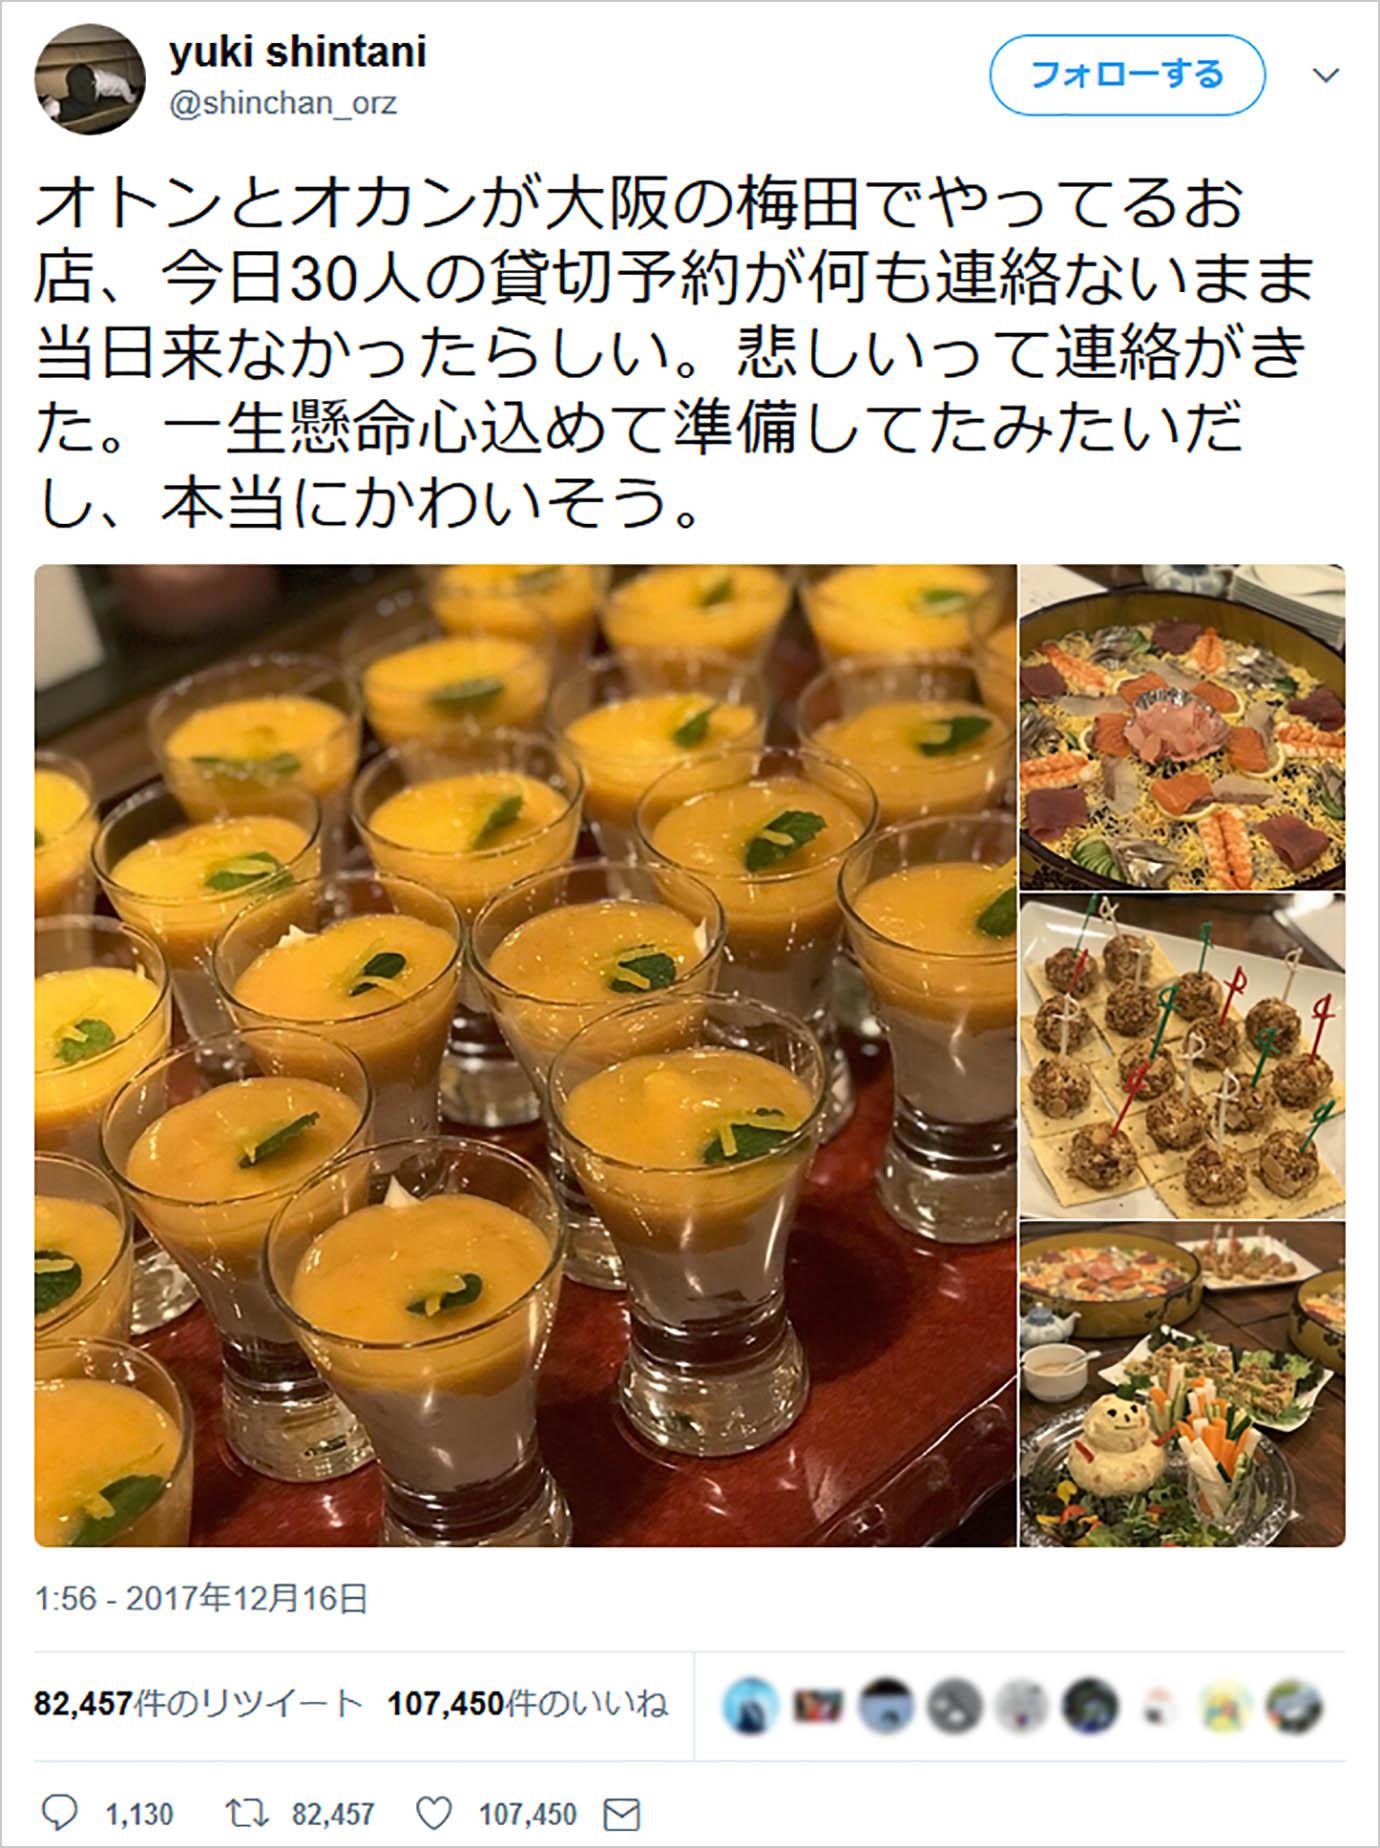 kanashii1